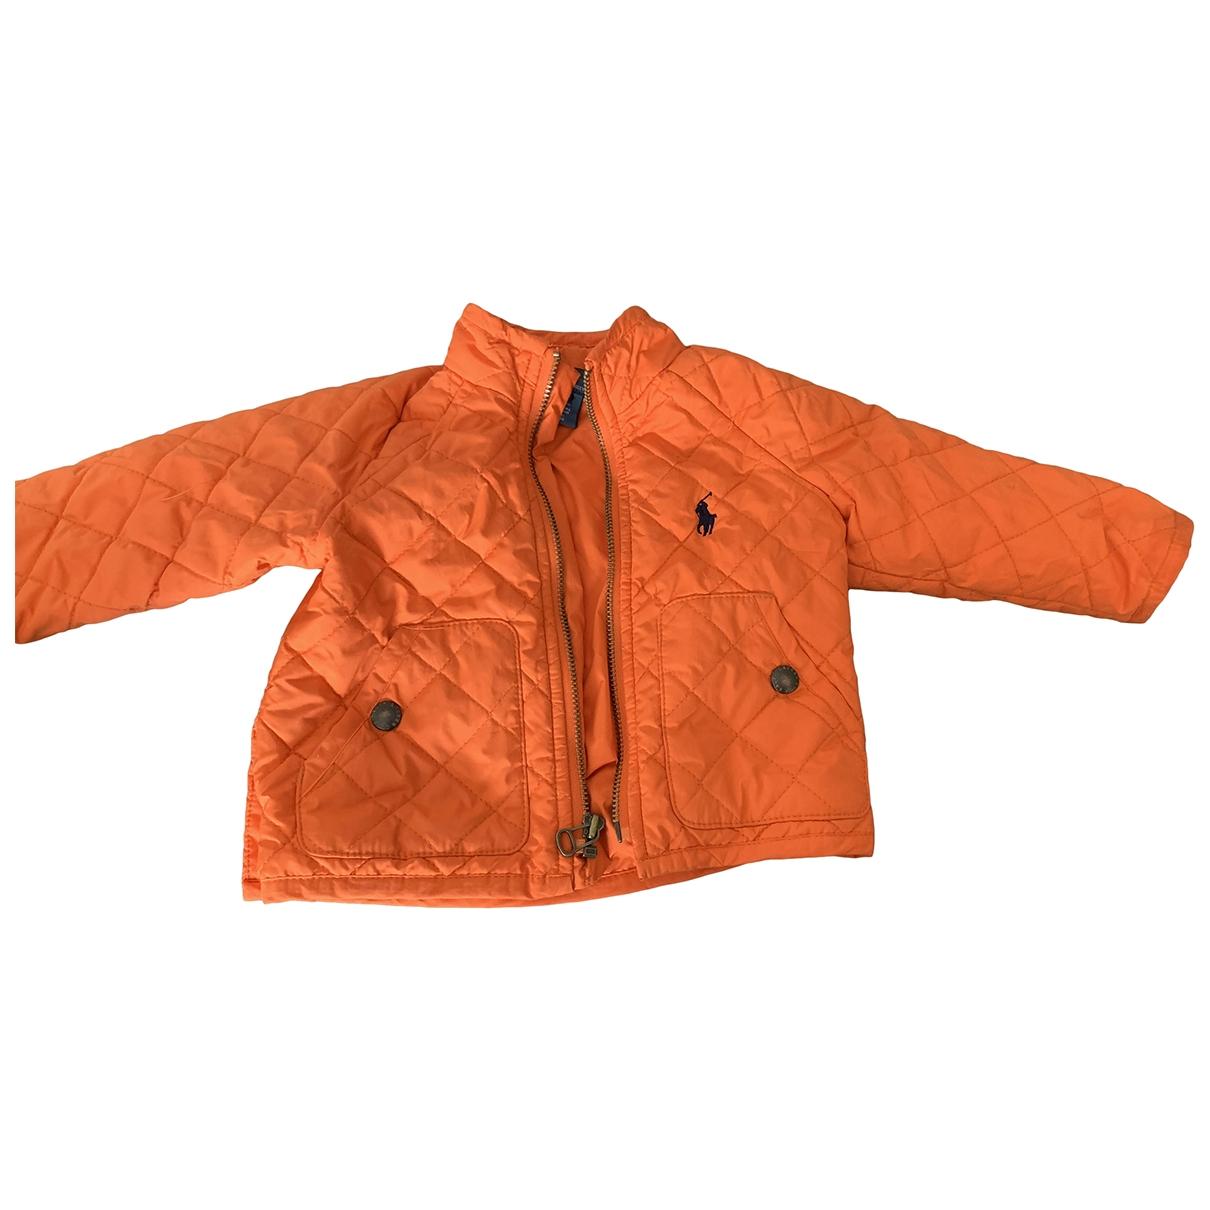 Polo Ralph Lauren \N Jacke, Maentel in  Orange Polyester